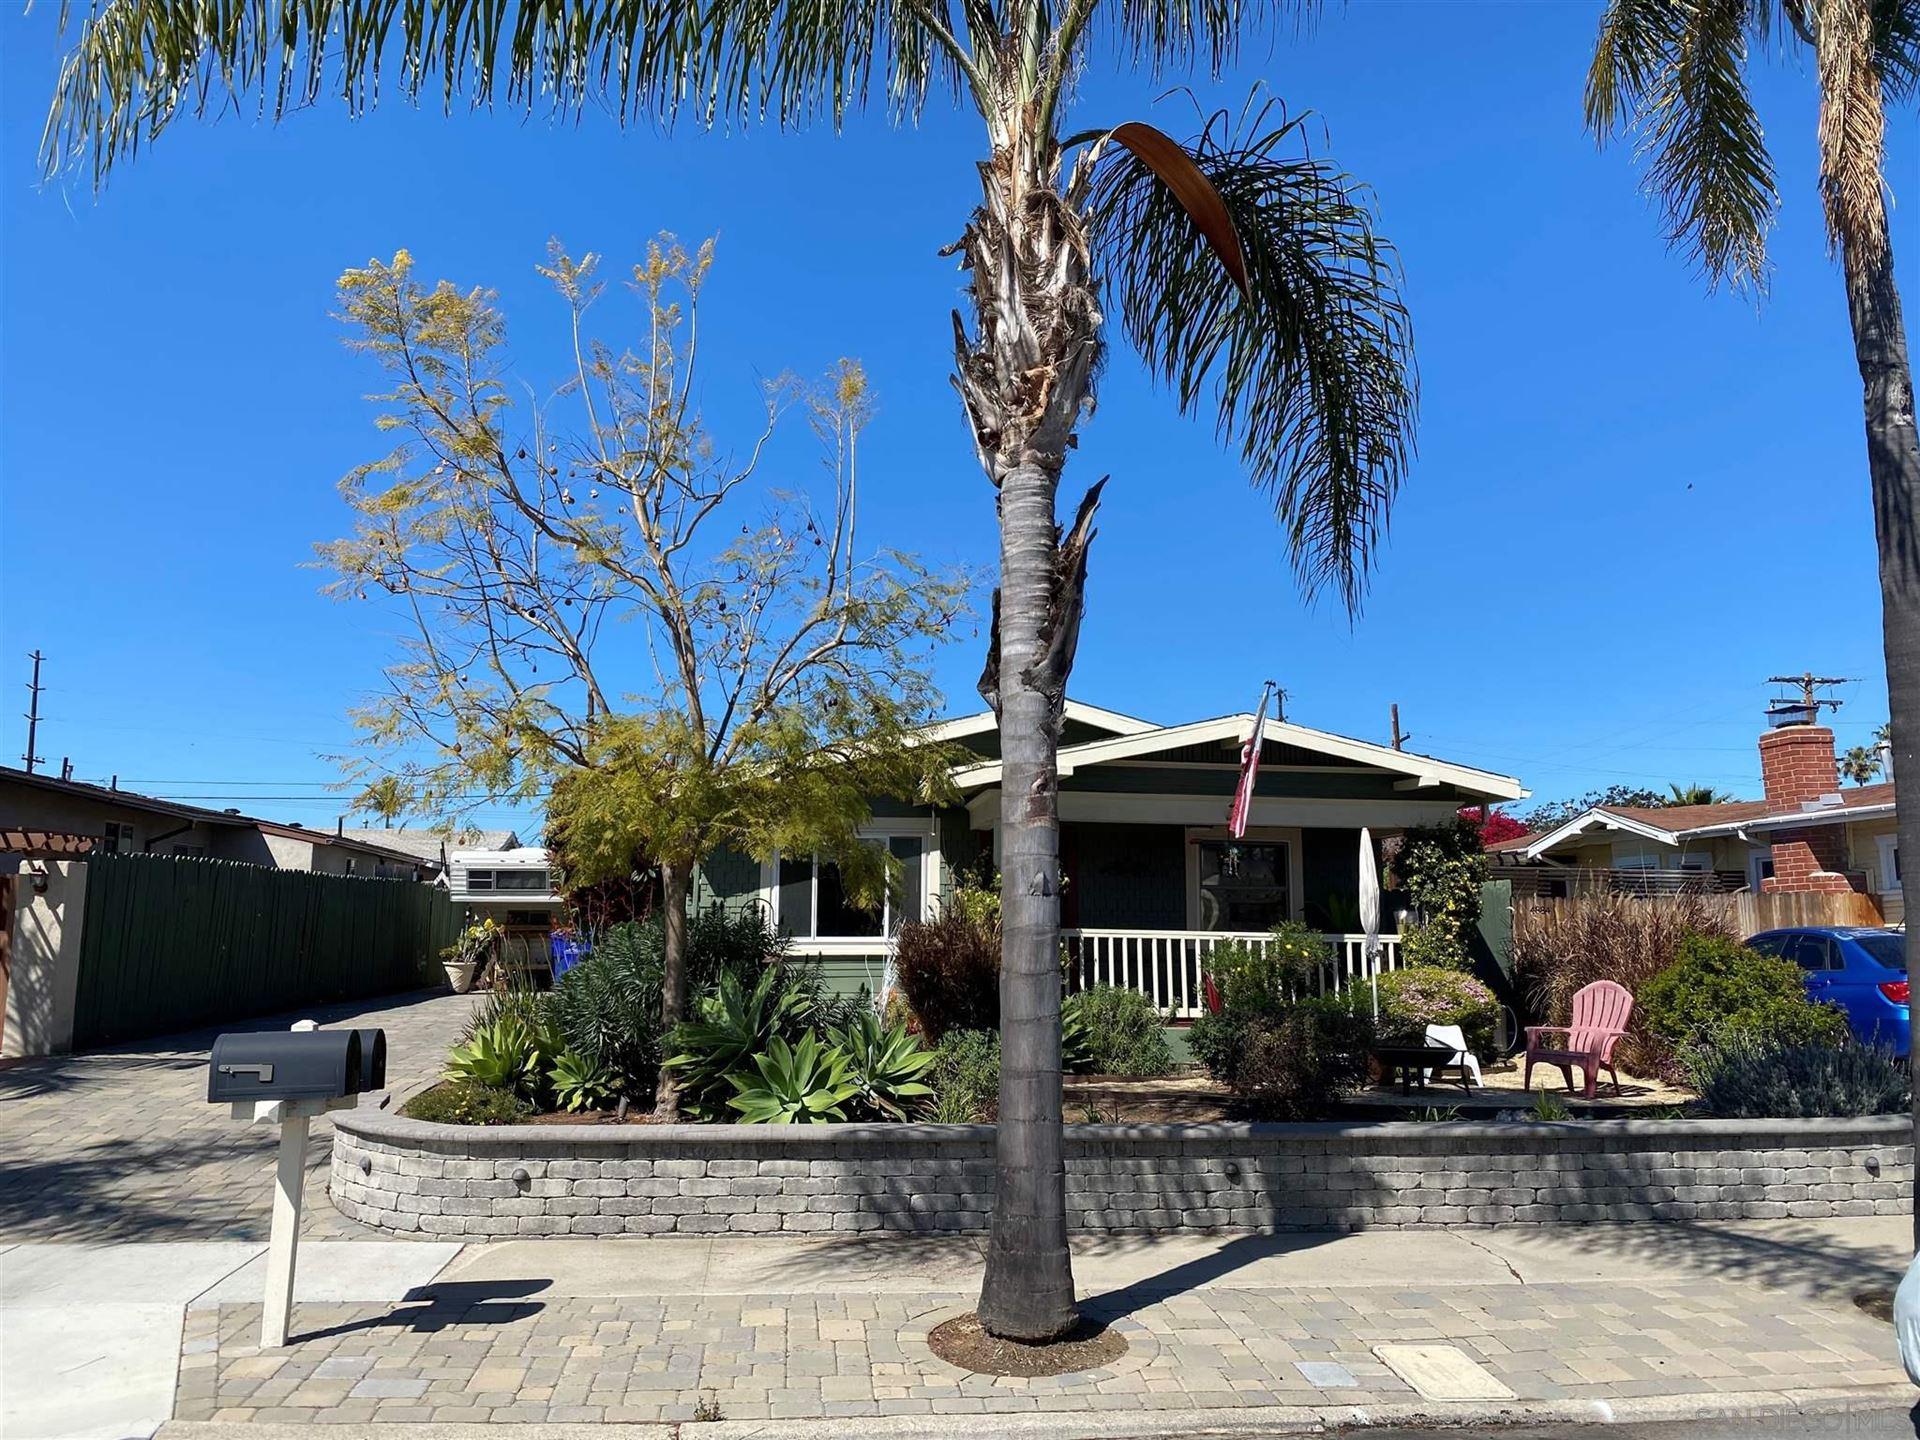 Photo of 4874-4876 Felton St, San Diego, CA 92116 (MLS # 210008530)